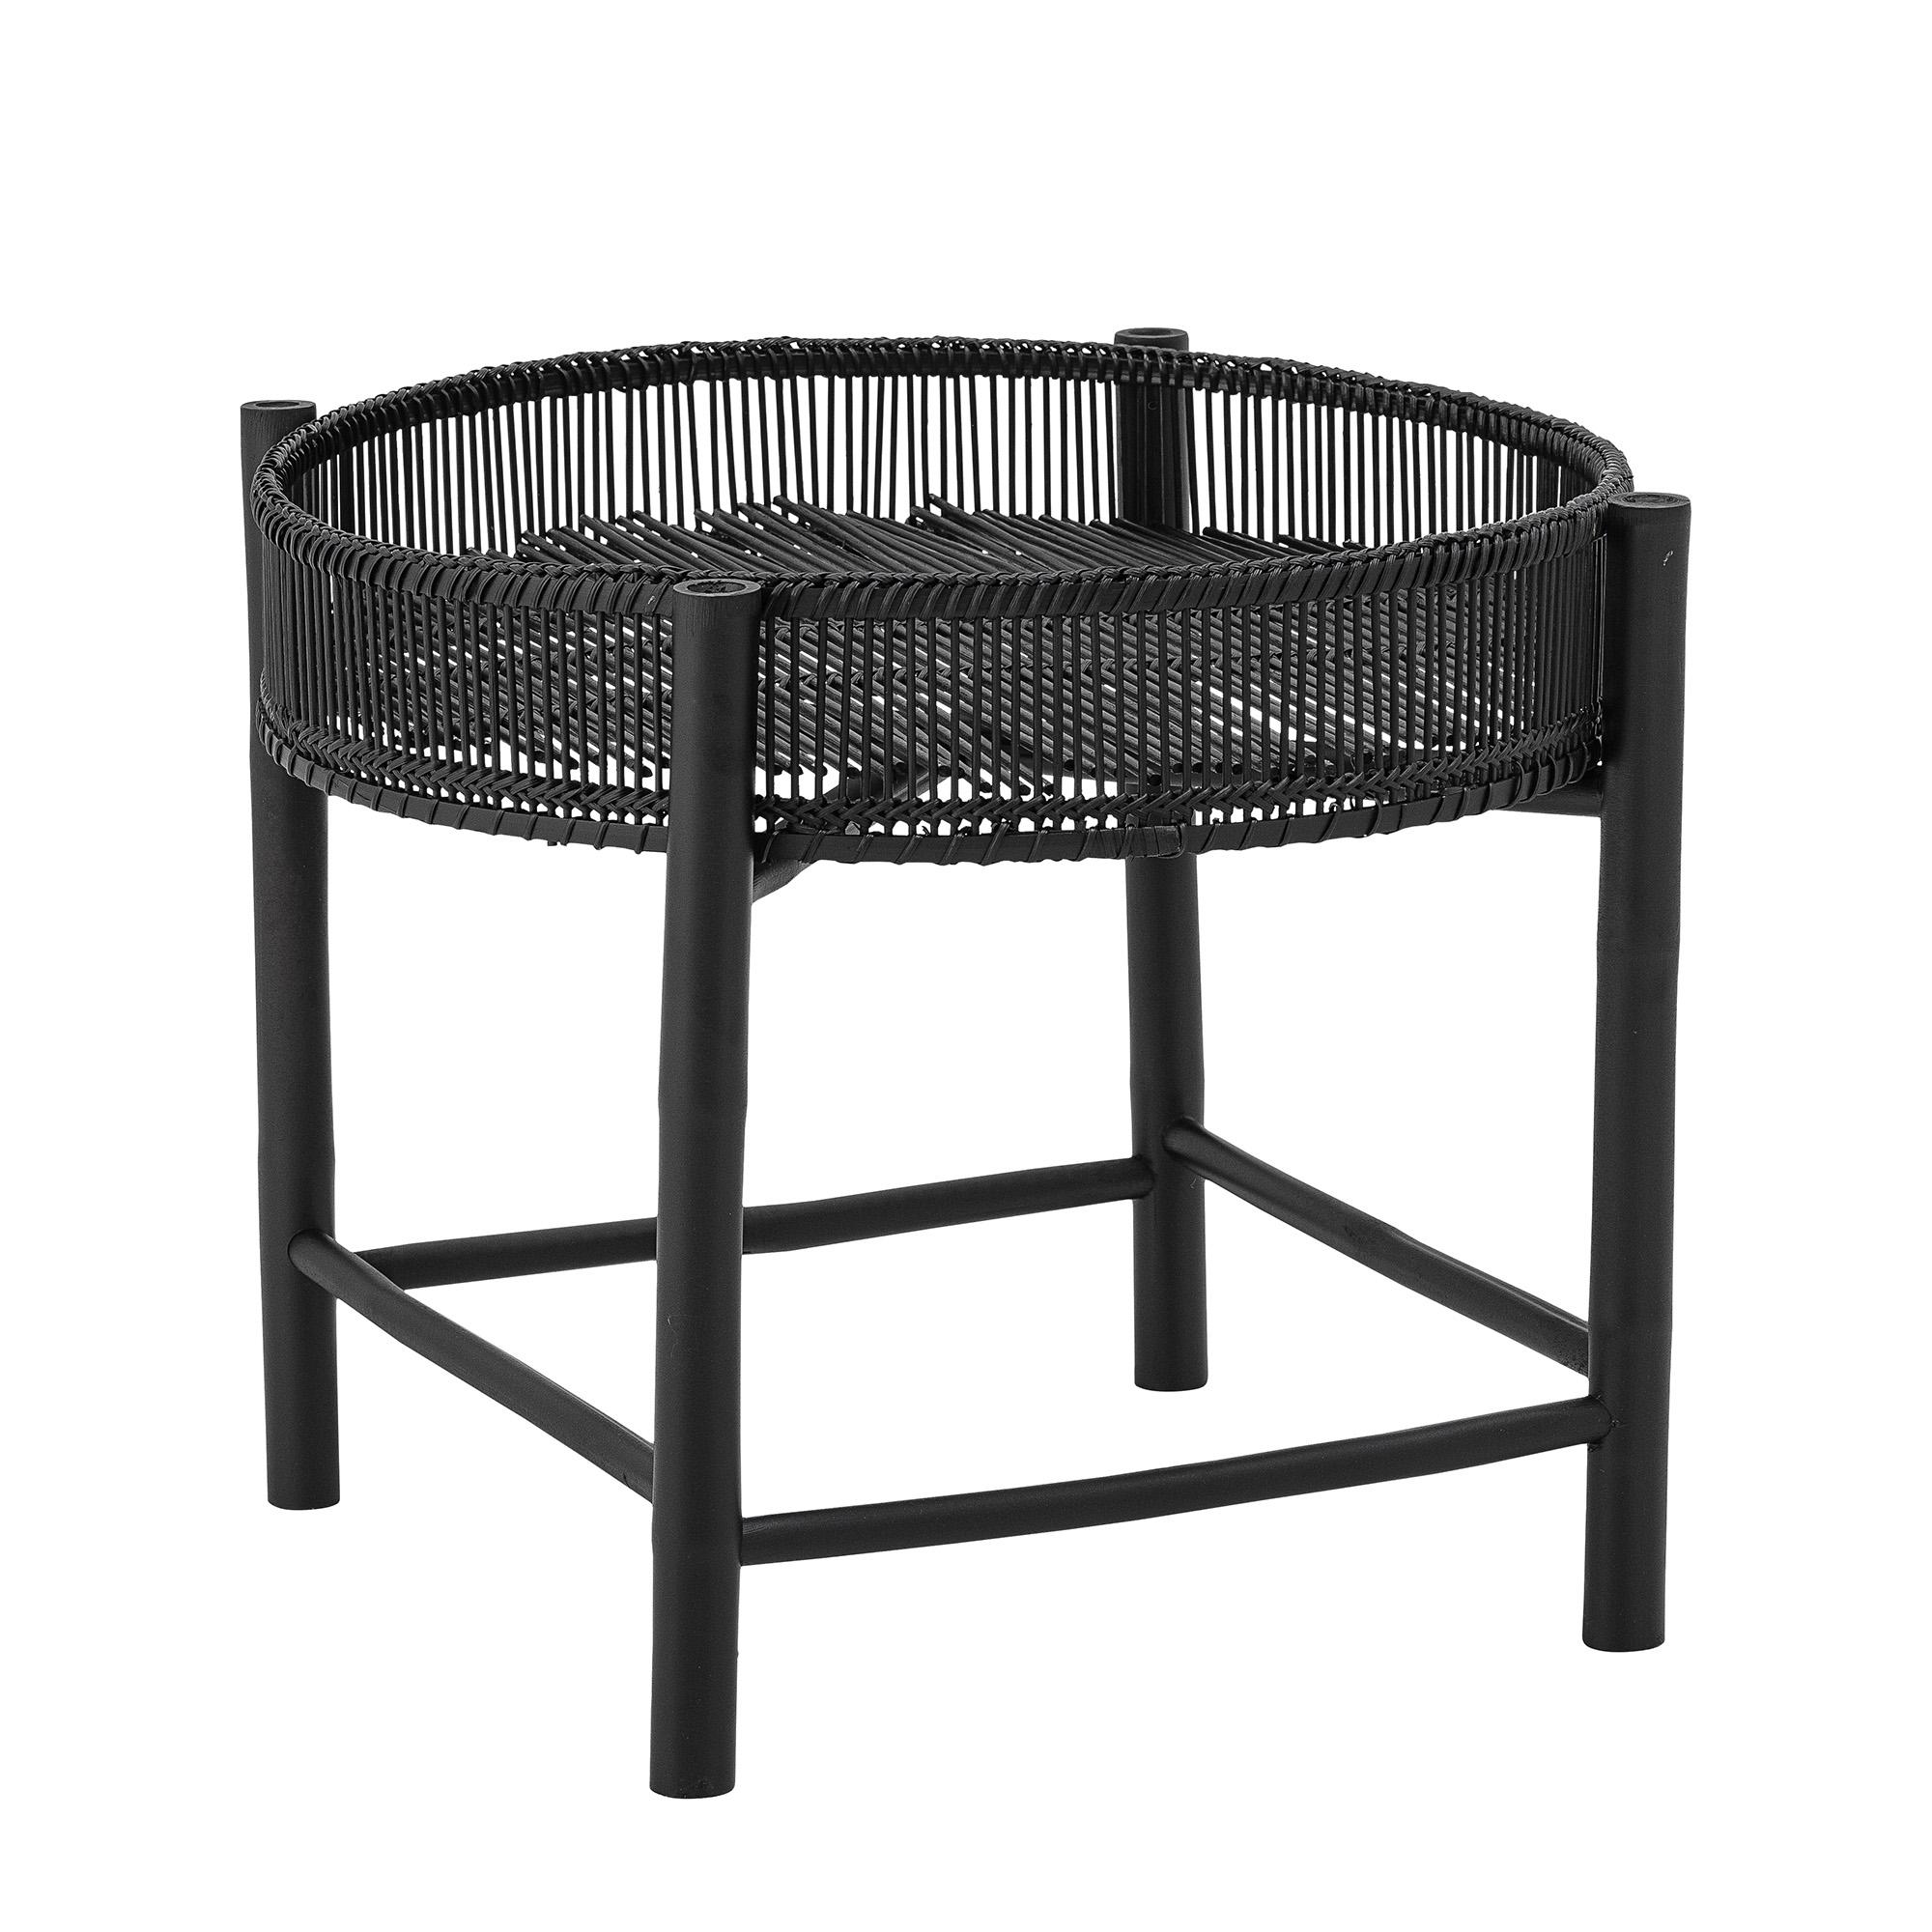 Table basse Ana en bambou noir